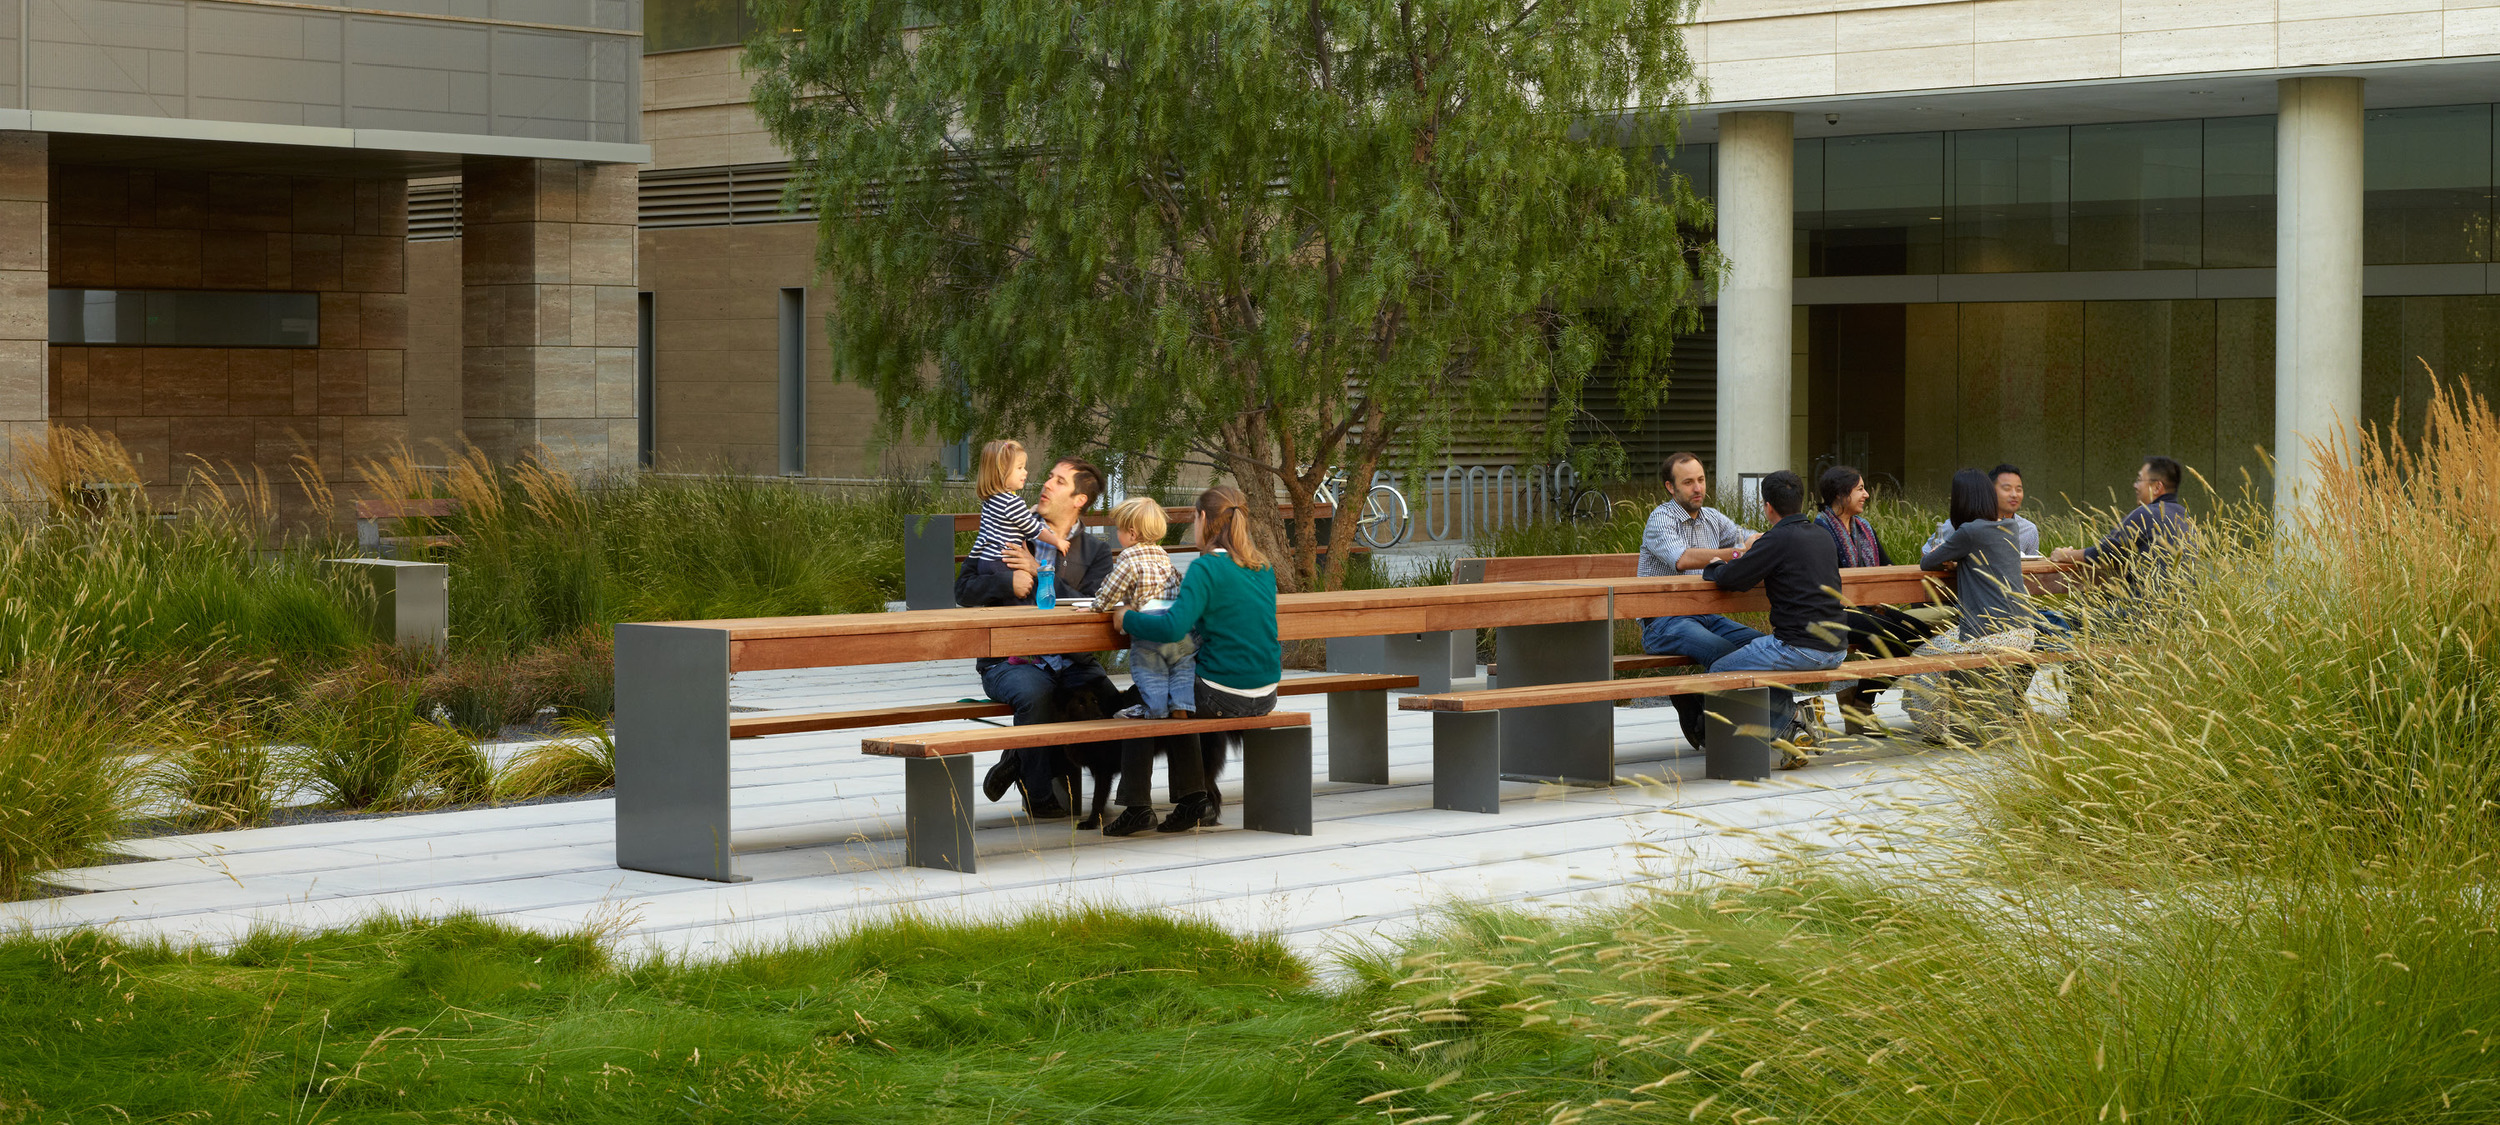 Smith Cardiovascular Research Building Andrea Cochran Landscape